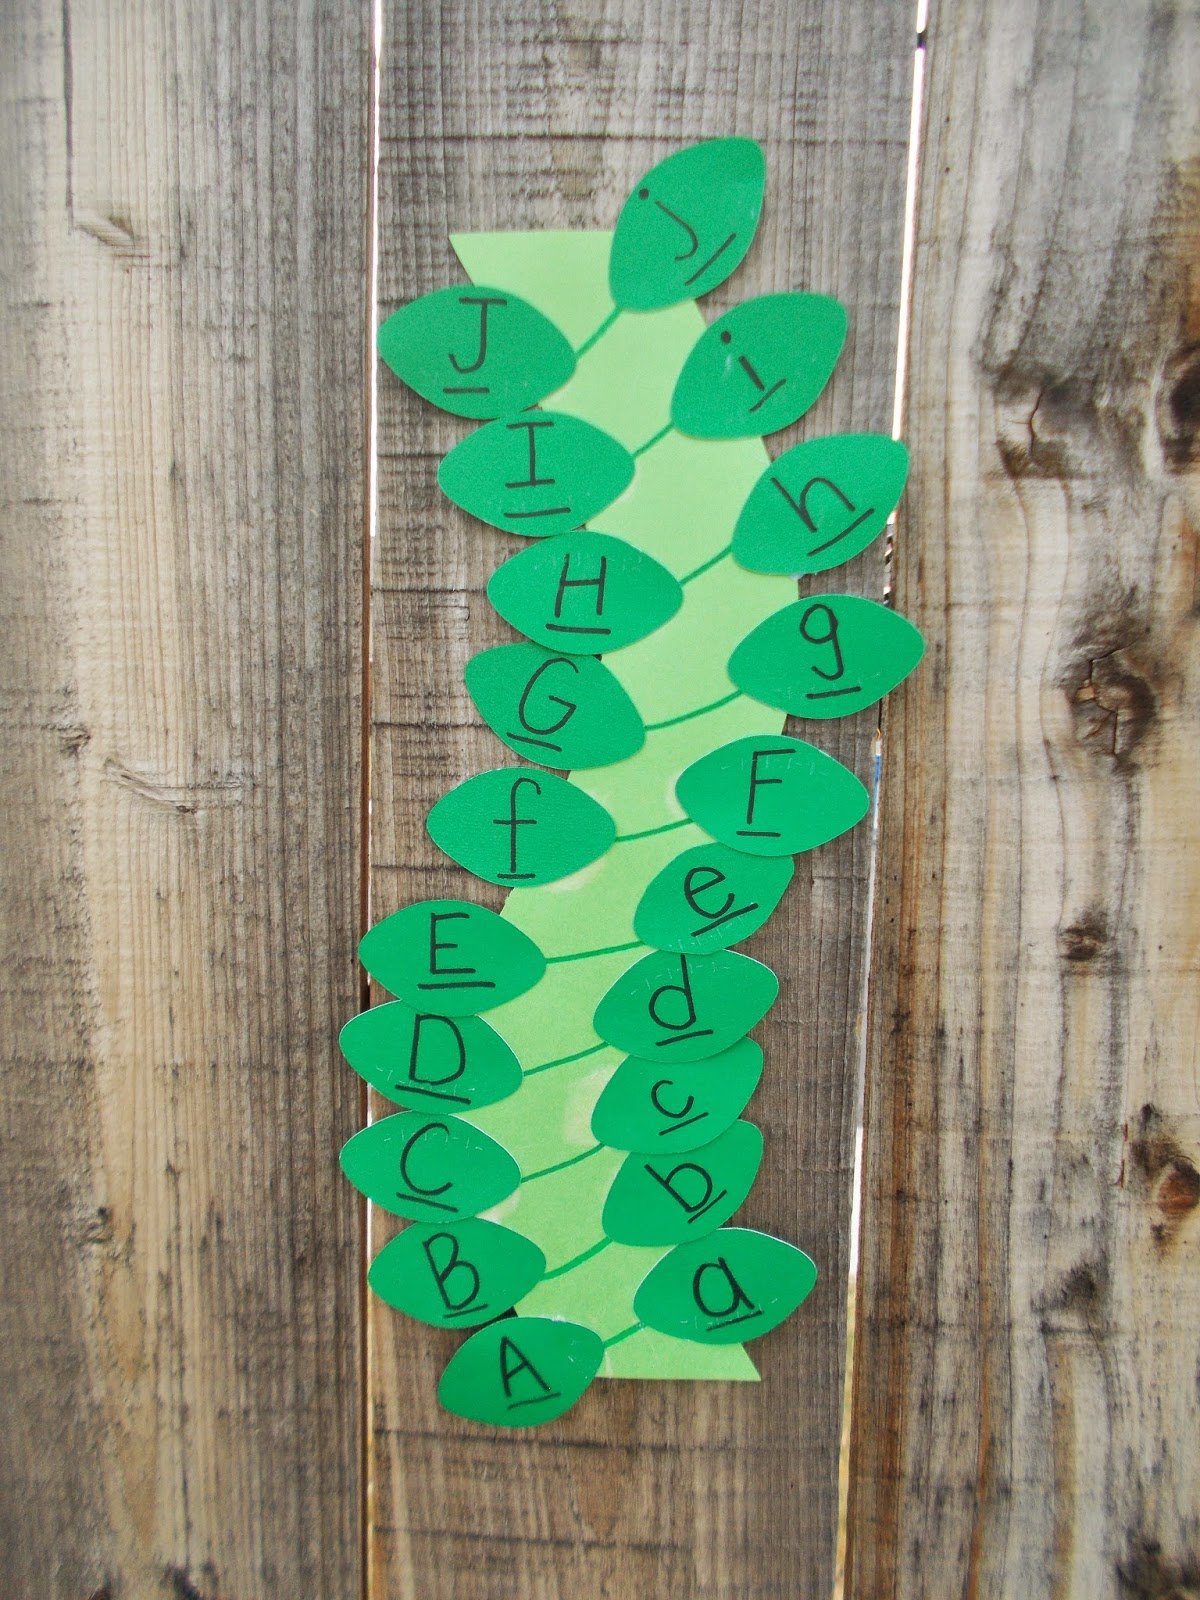 Chipman S Corner Preschool J Is For Jack And The Beanstalk